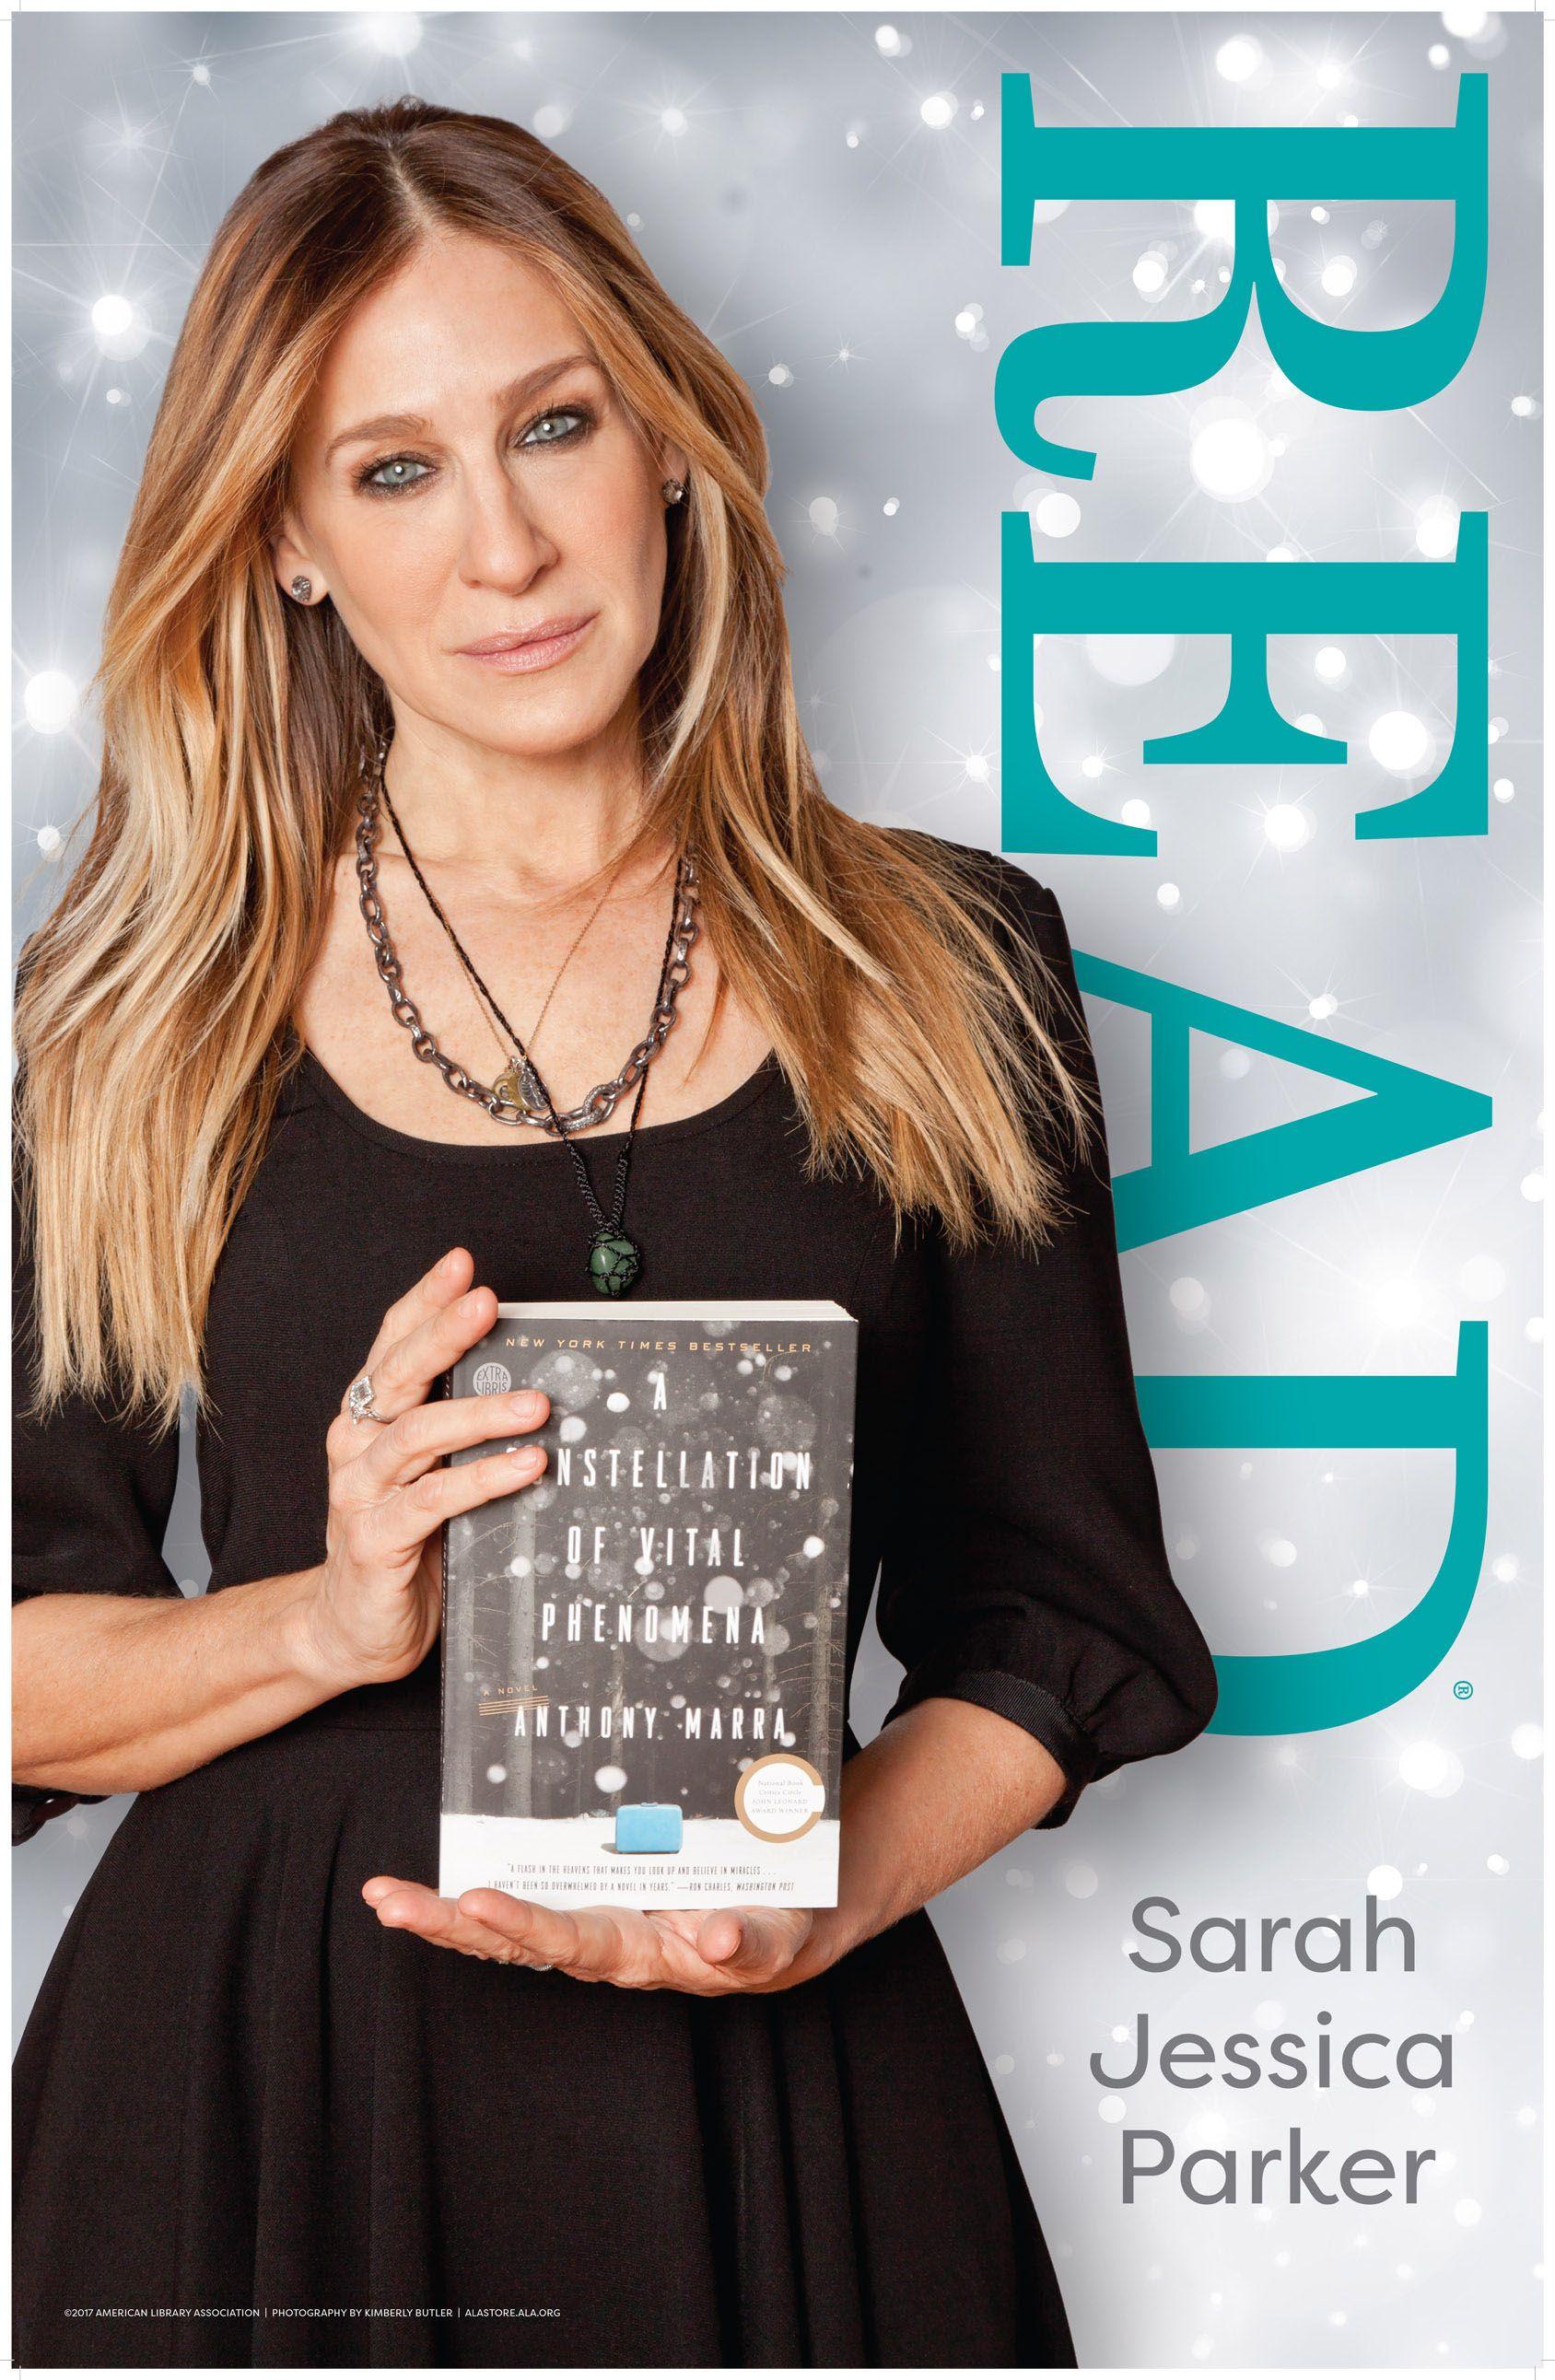 Sarah-jessica-parker_READ_Poster_HR.jpg